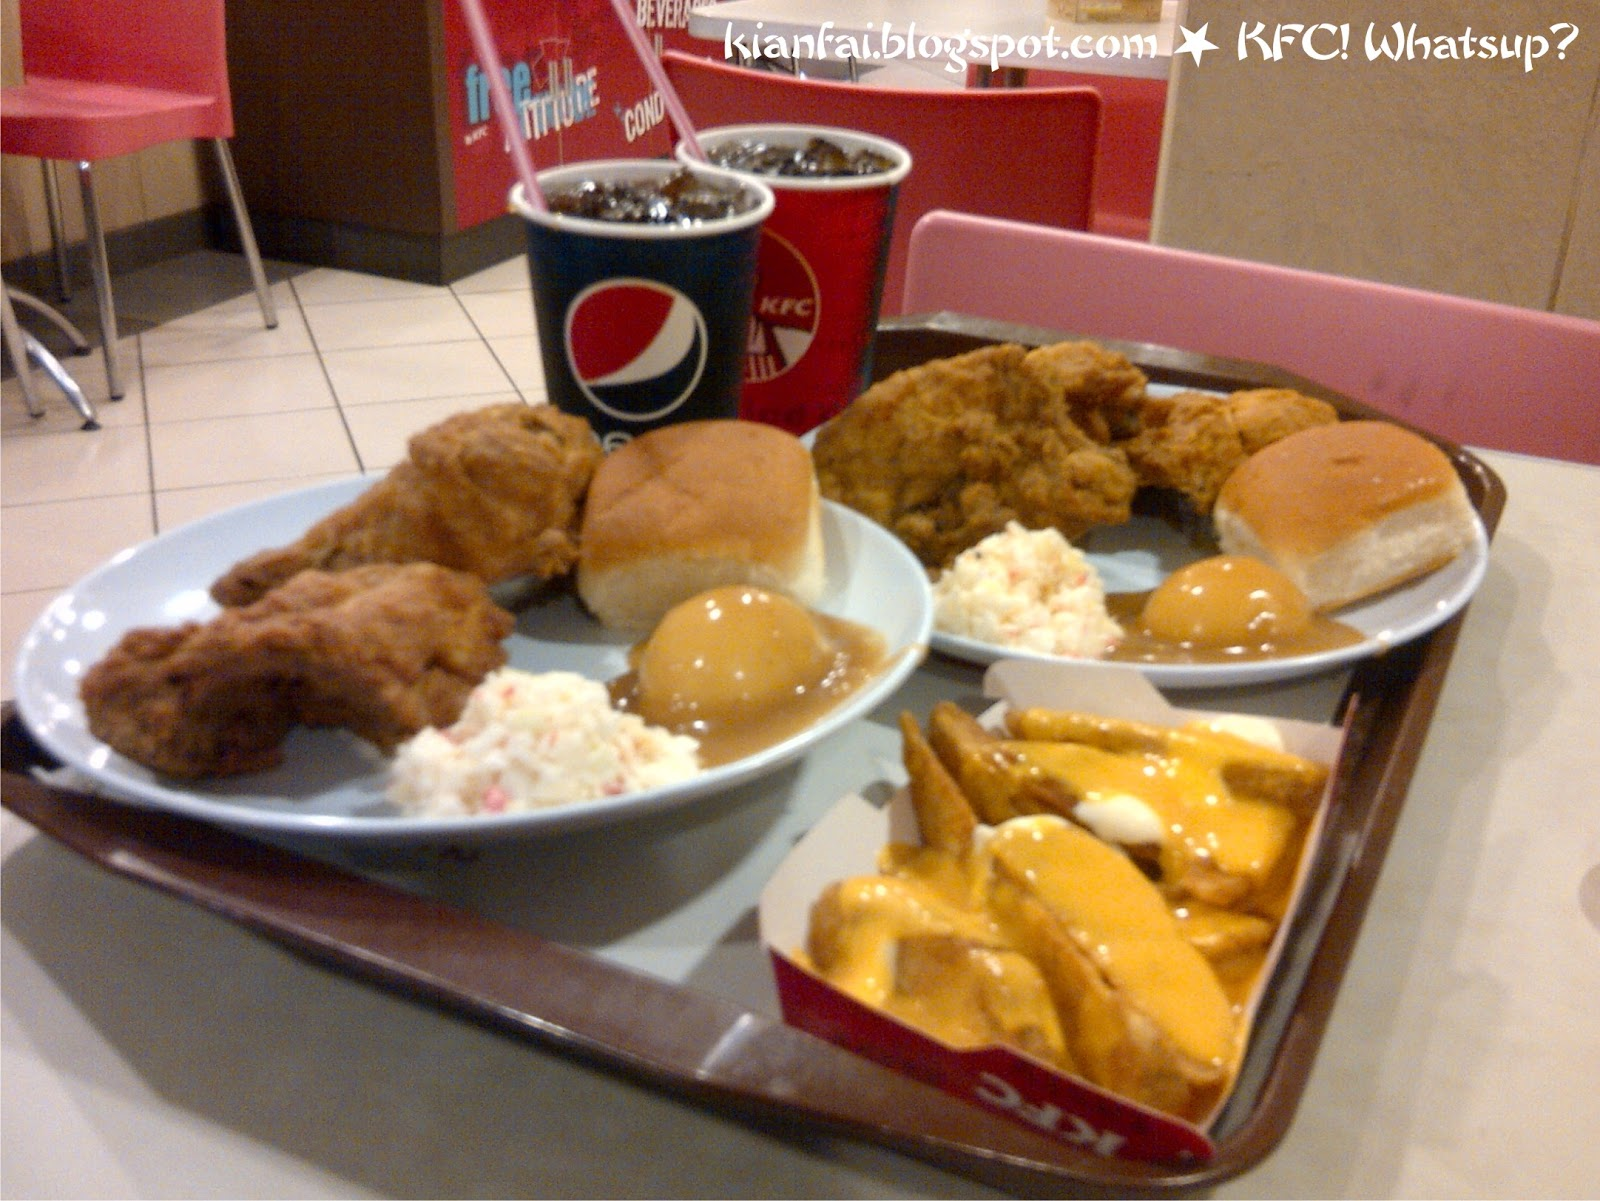 Kfc Food: Kianfai87 On PlayRole: KFC! Whatsup?